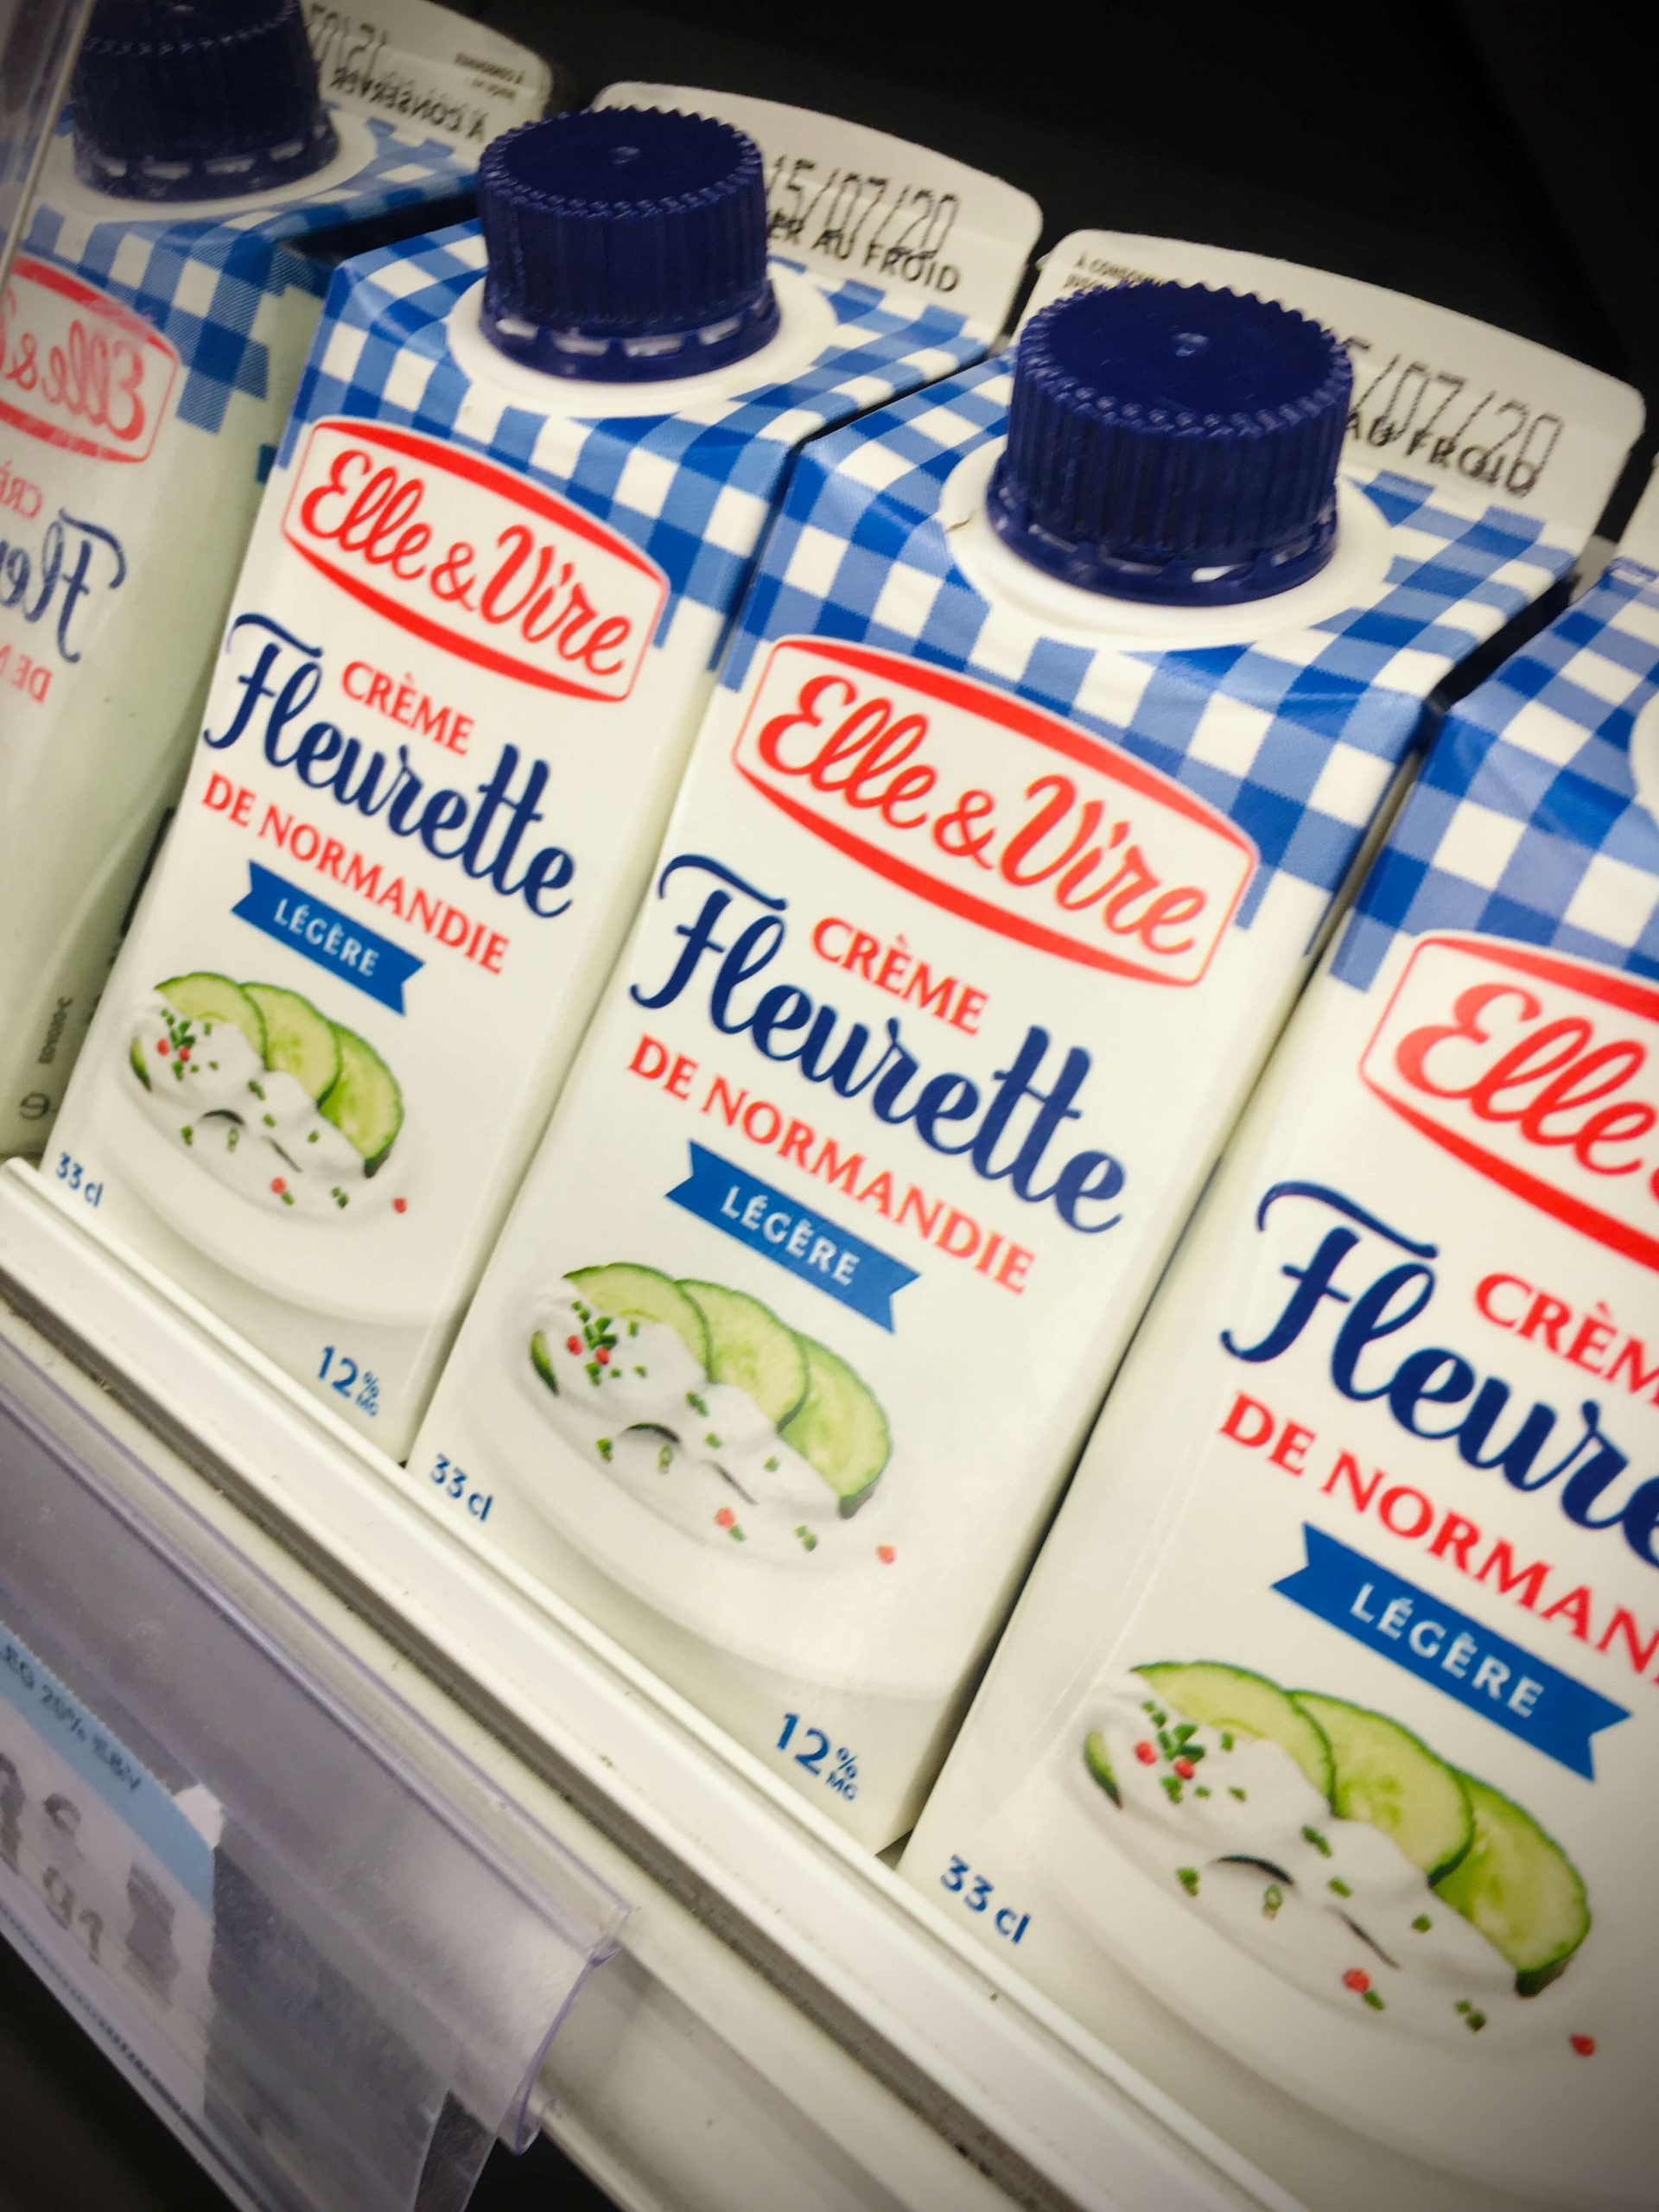 Small cartons of French heavy cream